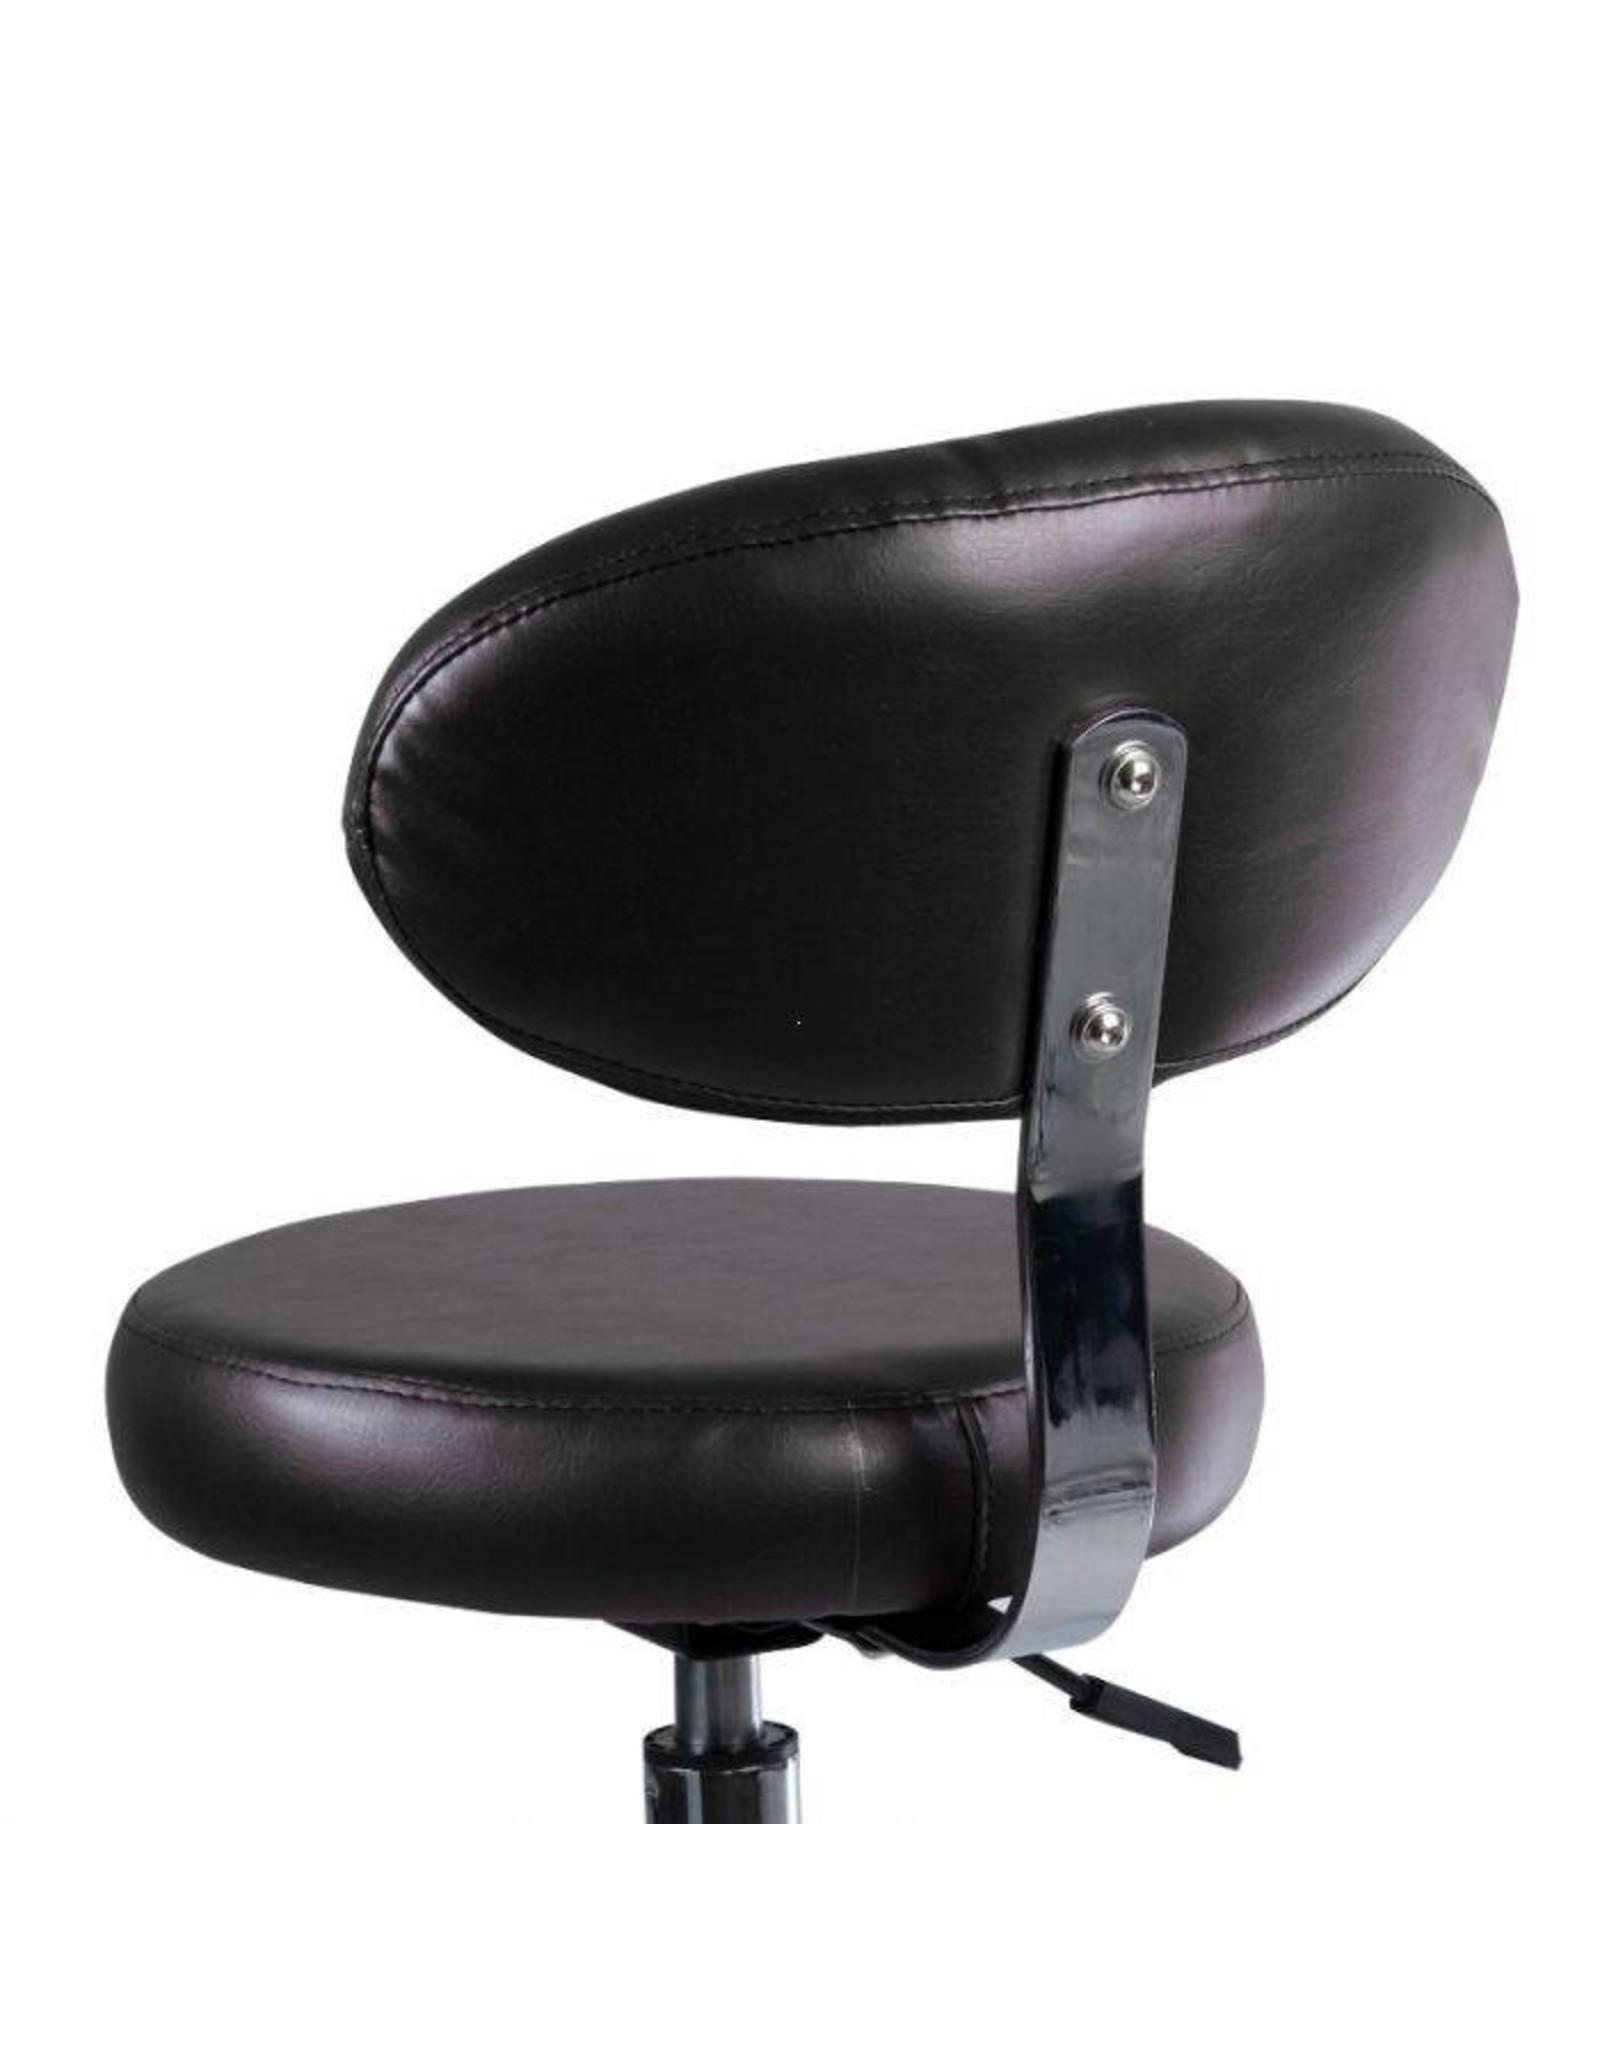 Mega Beauty Shop® Salon kruk met rugleuning - zwart